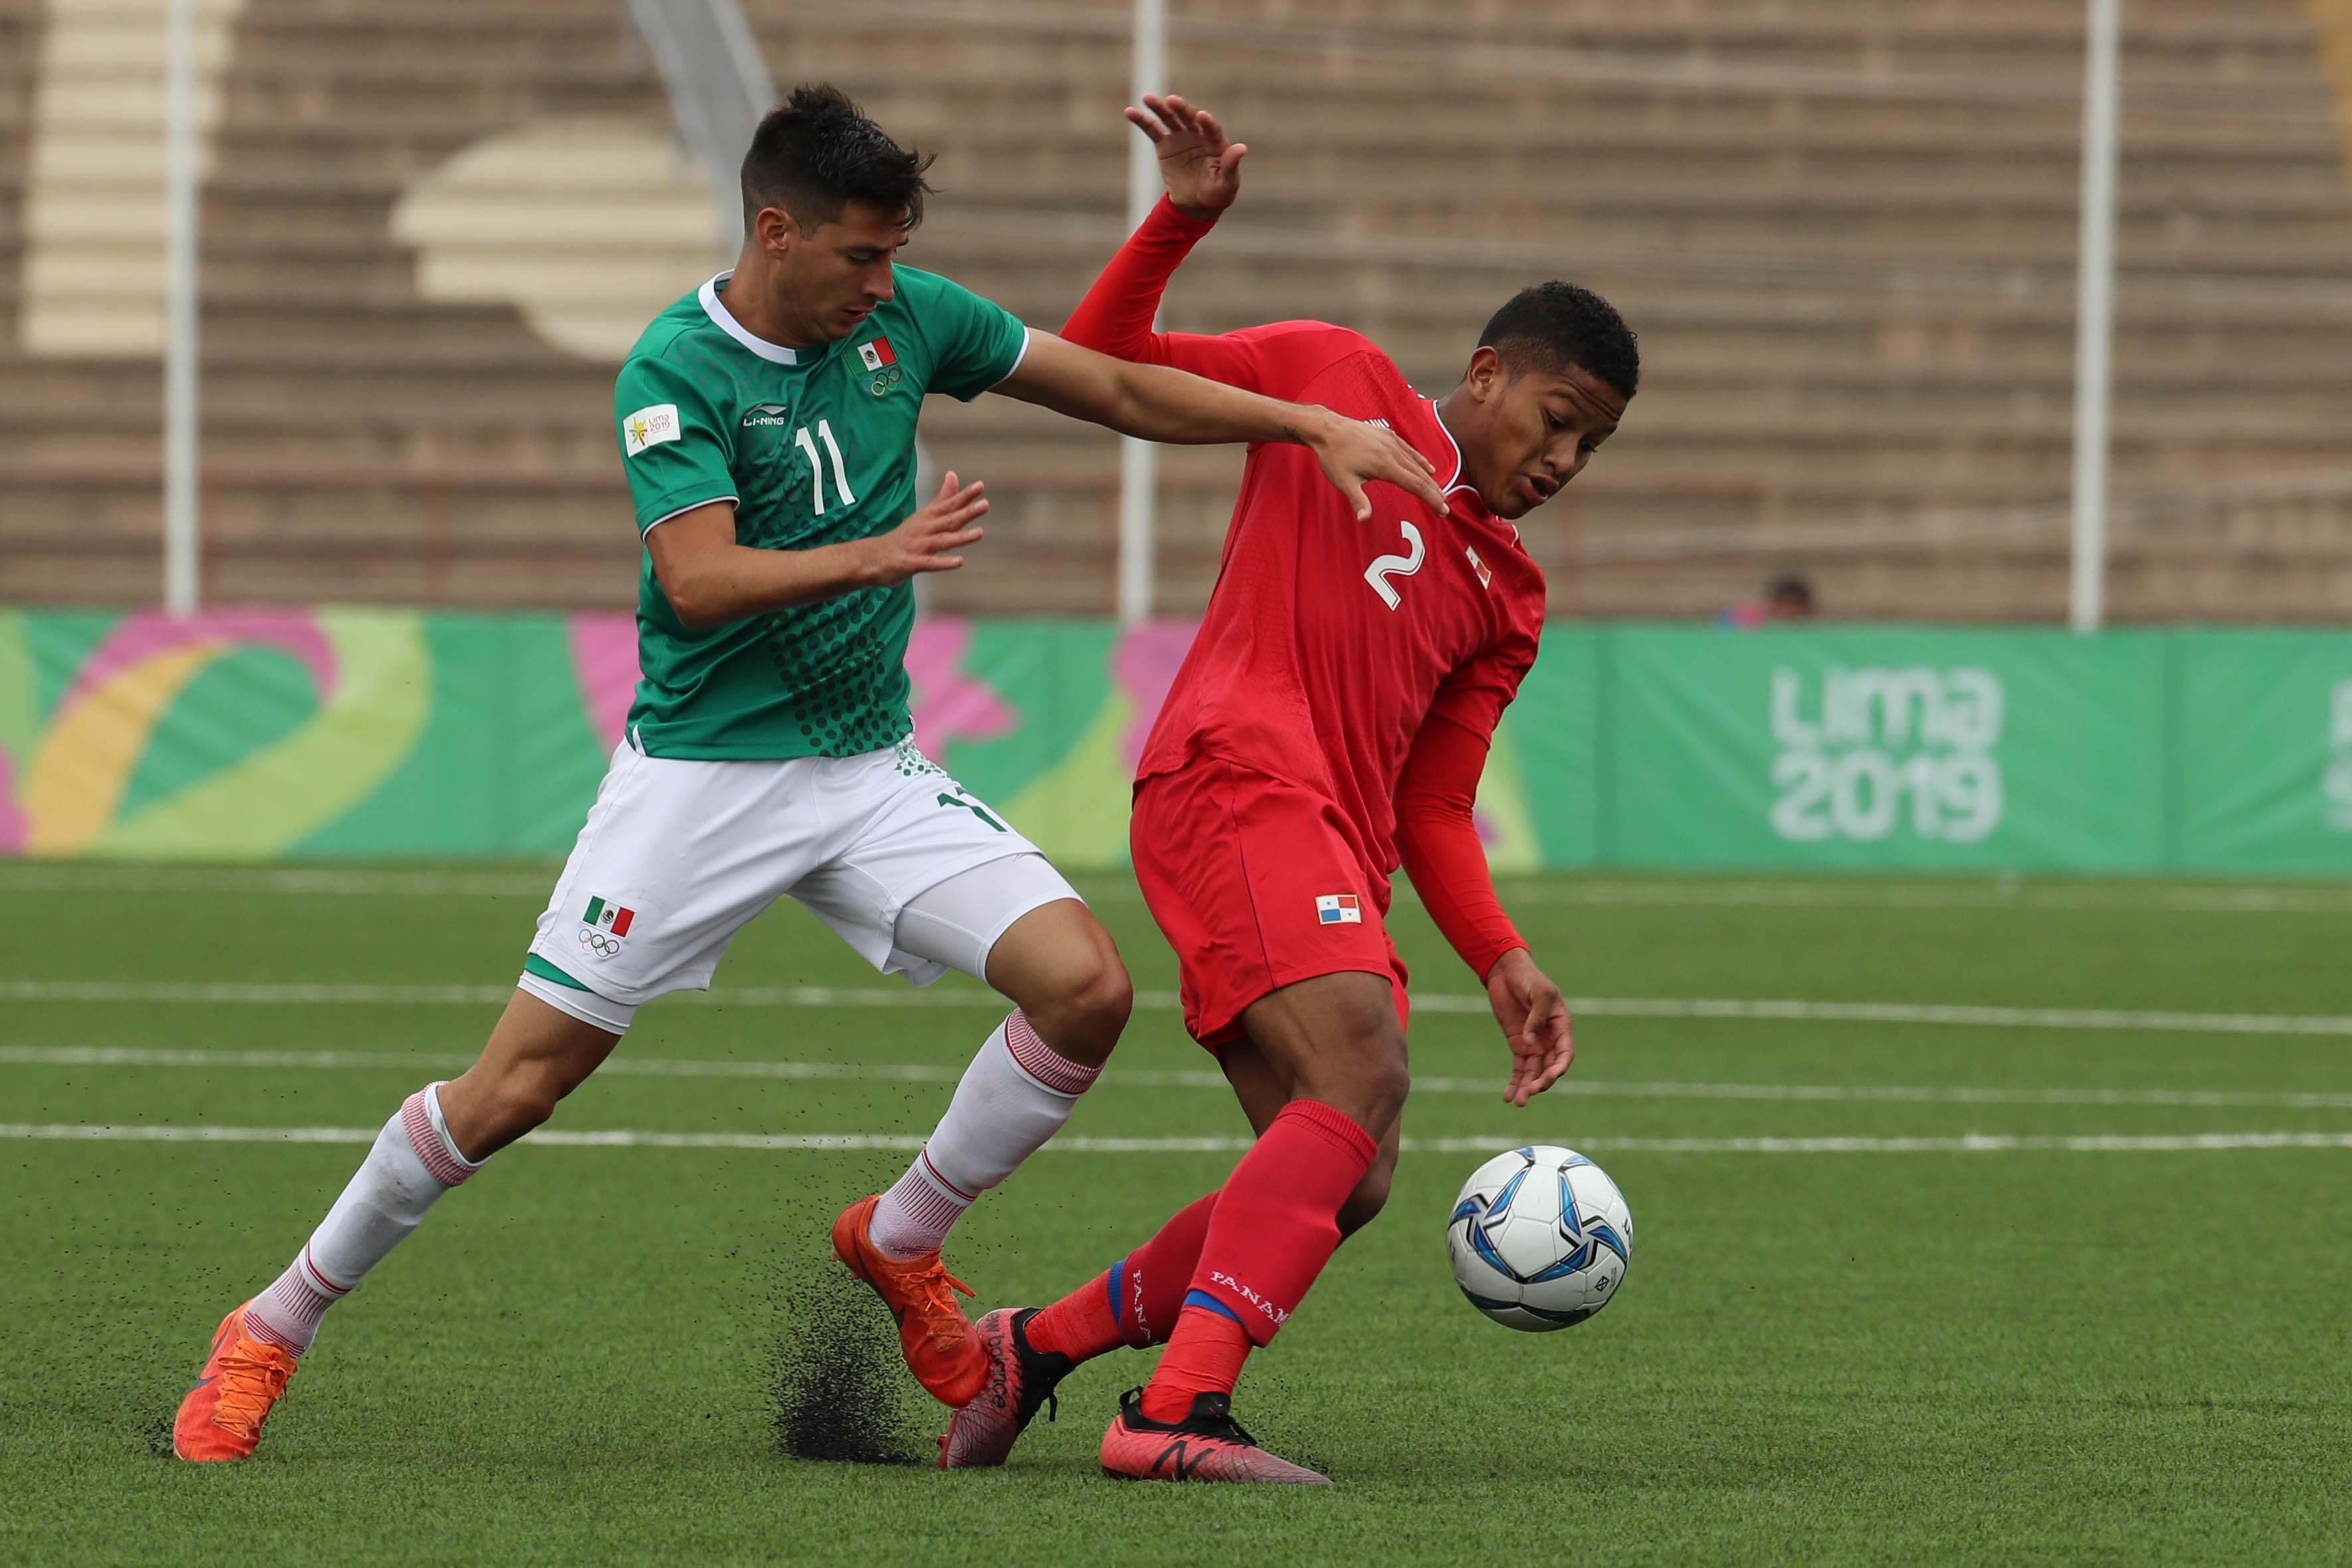 Jesús Godínez falla penalti y México empata contra Panamá en Lima 2019